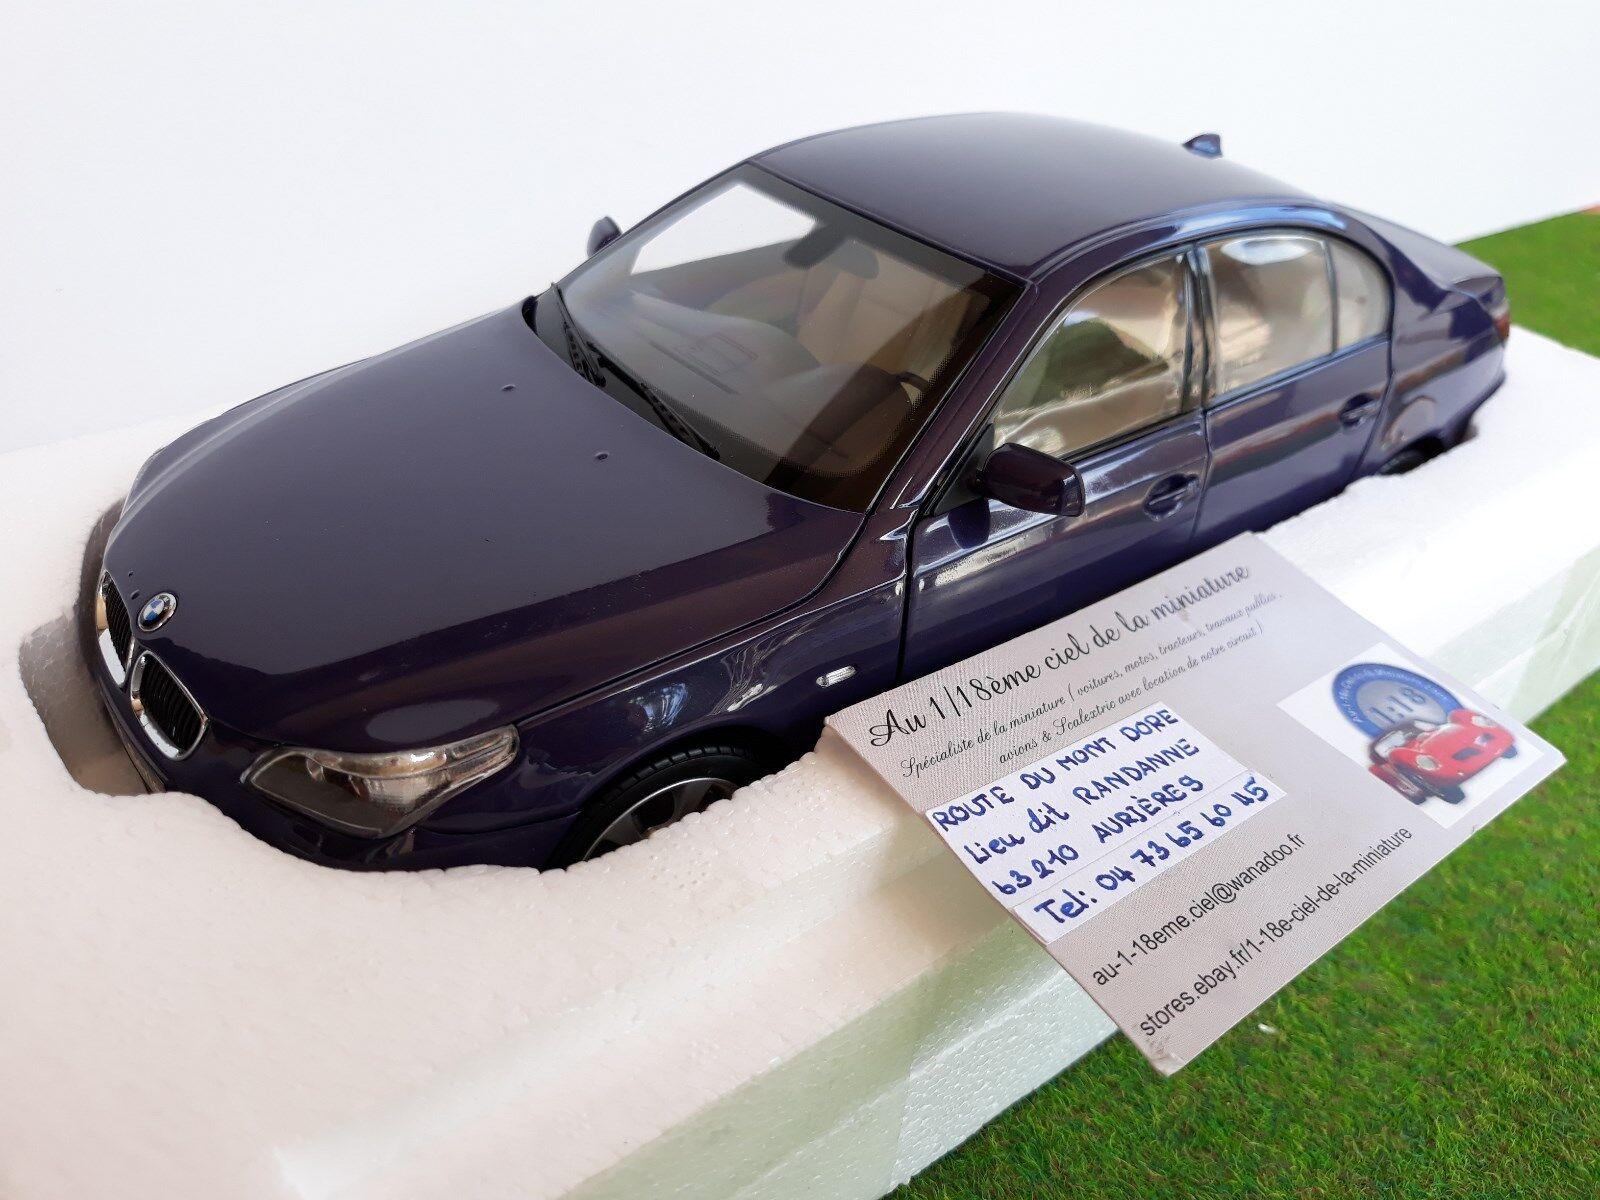 BMW 545i SEDAN púrpura púrpura 1 18 KYOSHO 08591SP voiture miniature collection